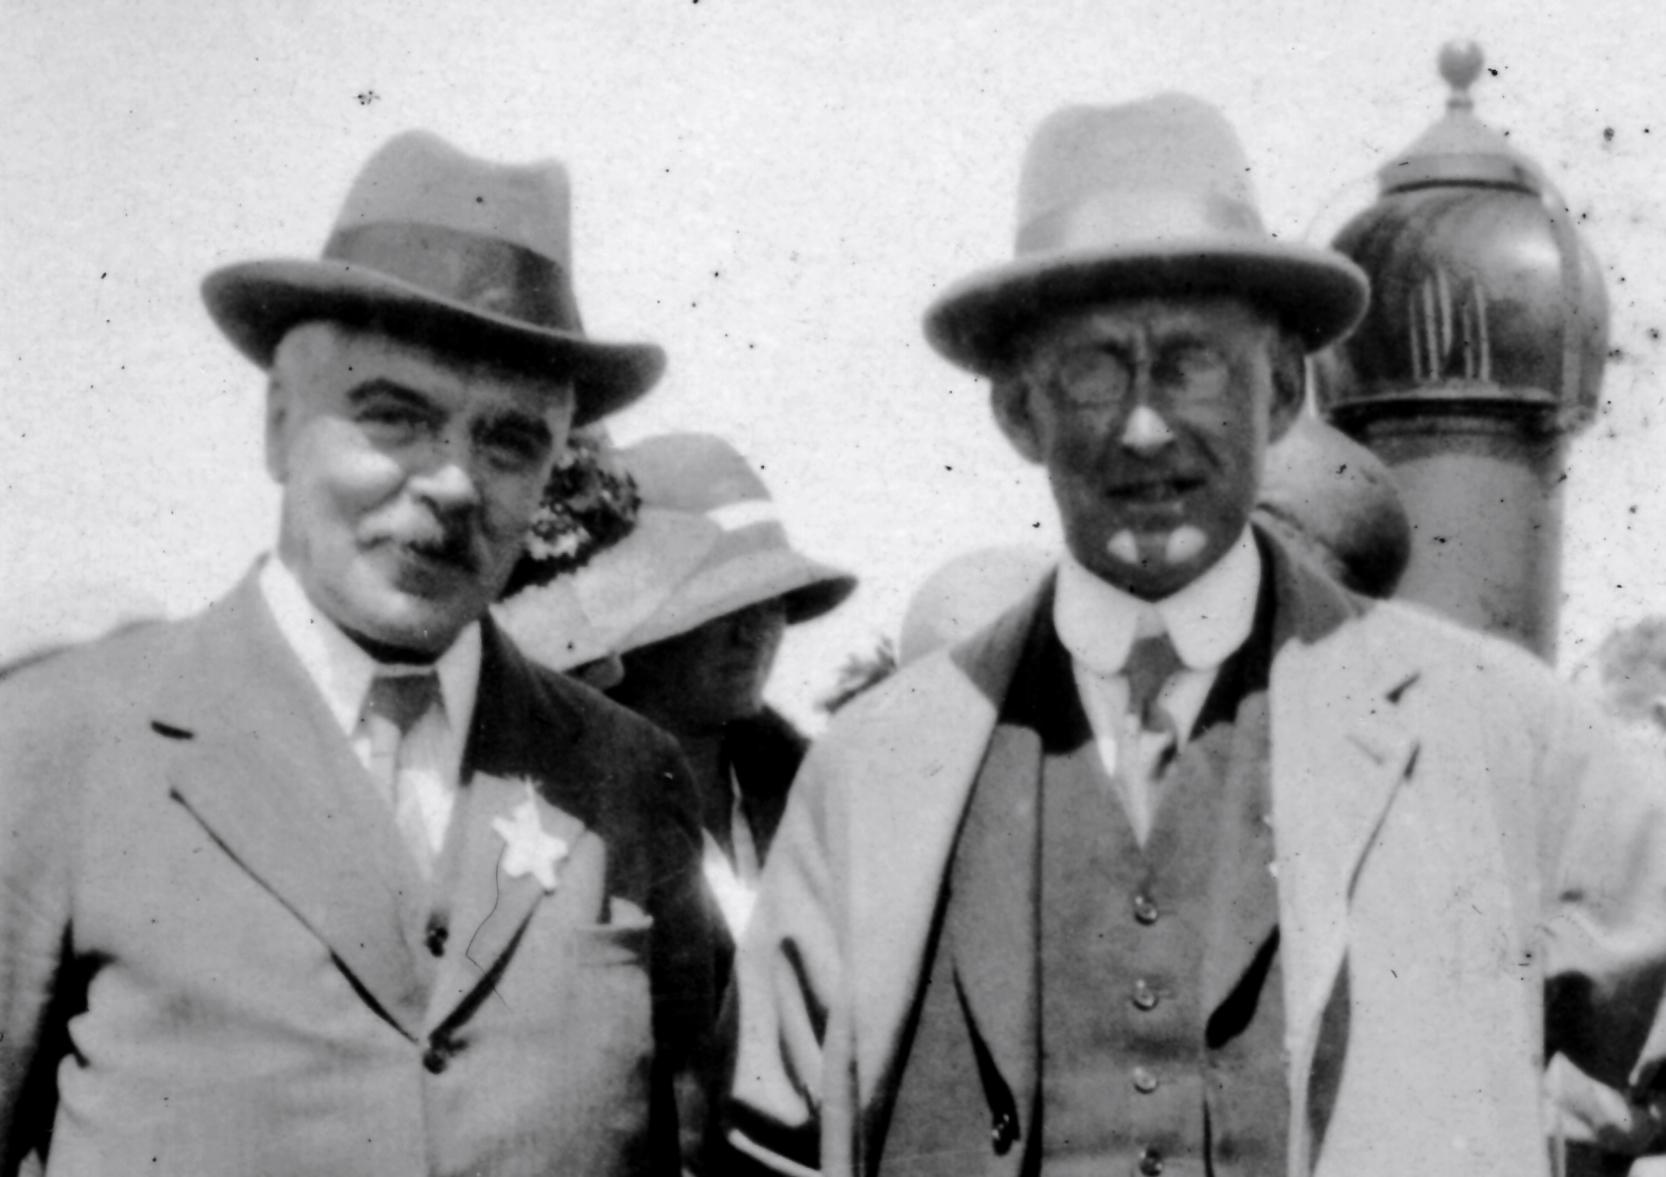 Frank Dyson (izquierda) y Arthur Eddington (derecha). Credit: AIP Emilio SegrË Visual Archives, W. F. Meggers Collection